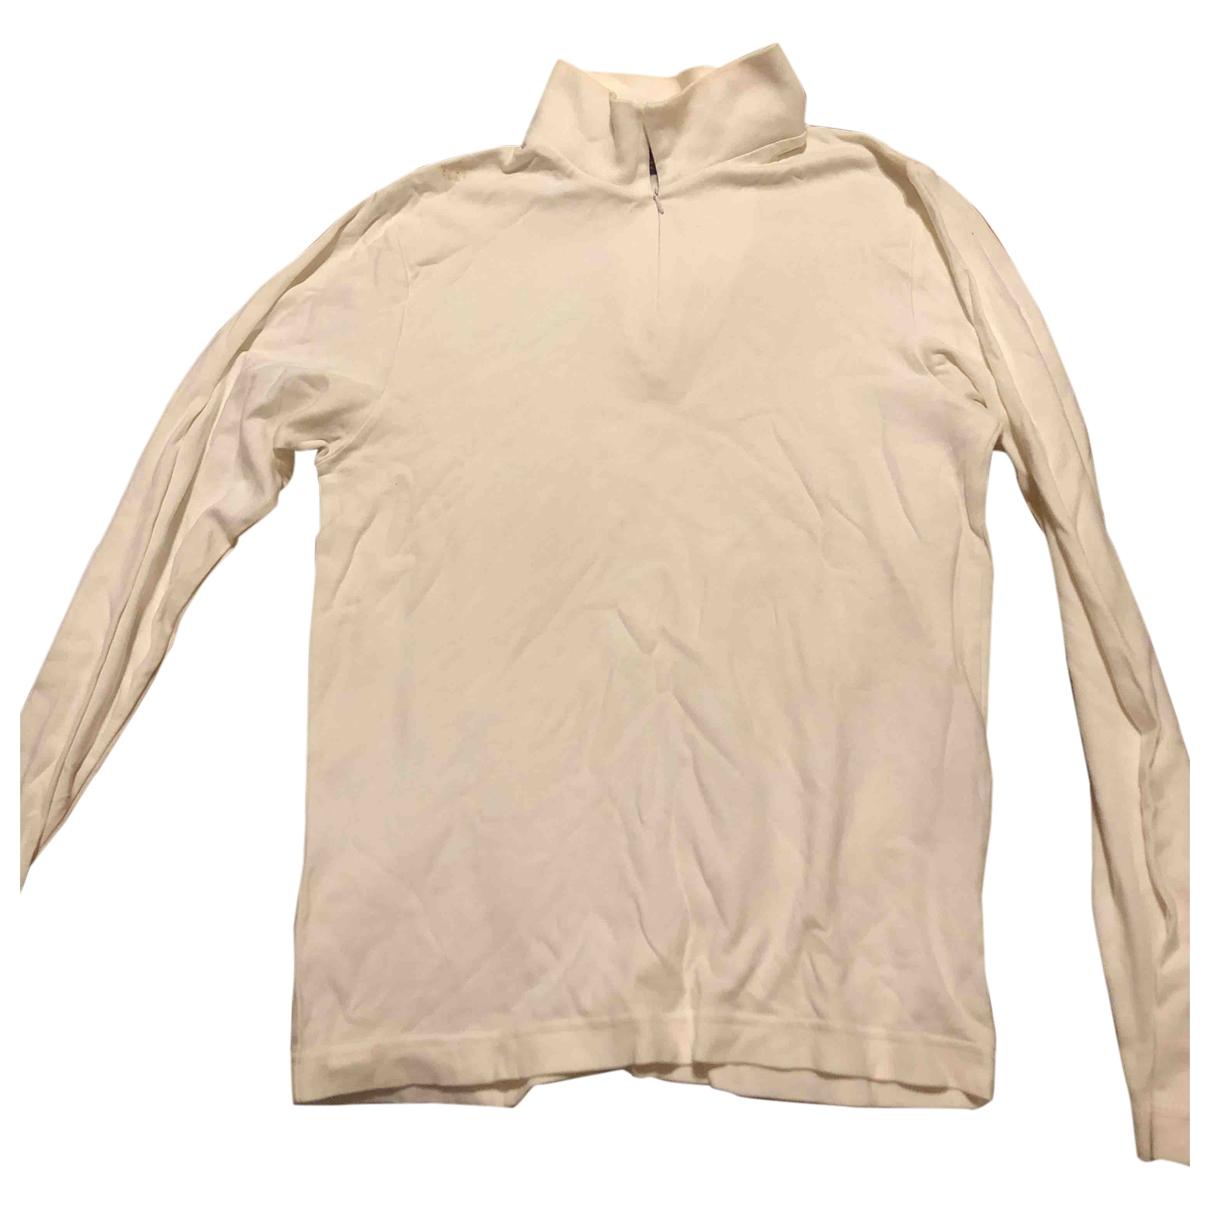 Kappa - Pulls.Gilets.Sweats   pour homme en coton - blanc